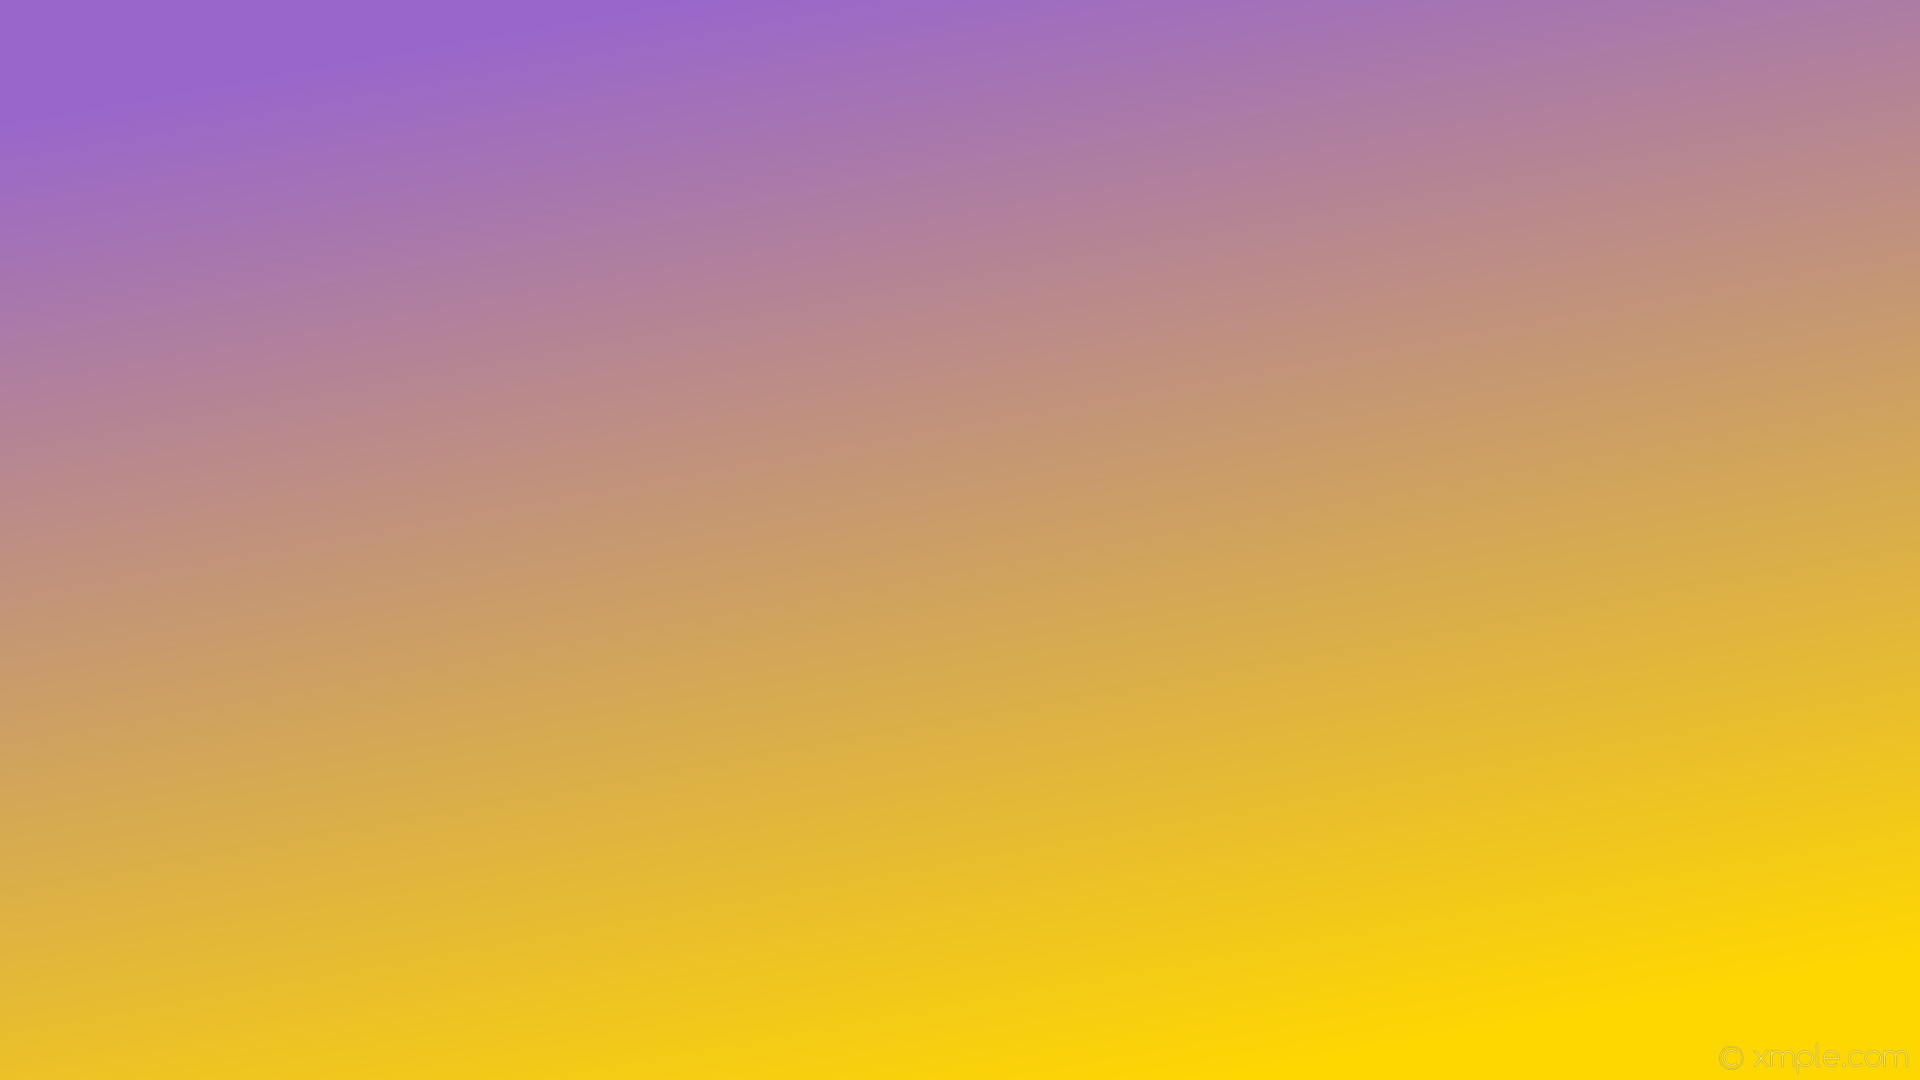 wallpaper linear yellow gradient purple gold amethyst #ffd700 #9966cc 300°